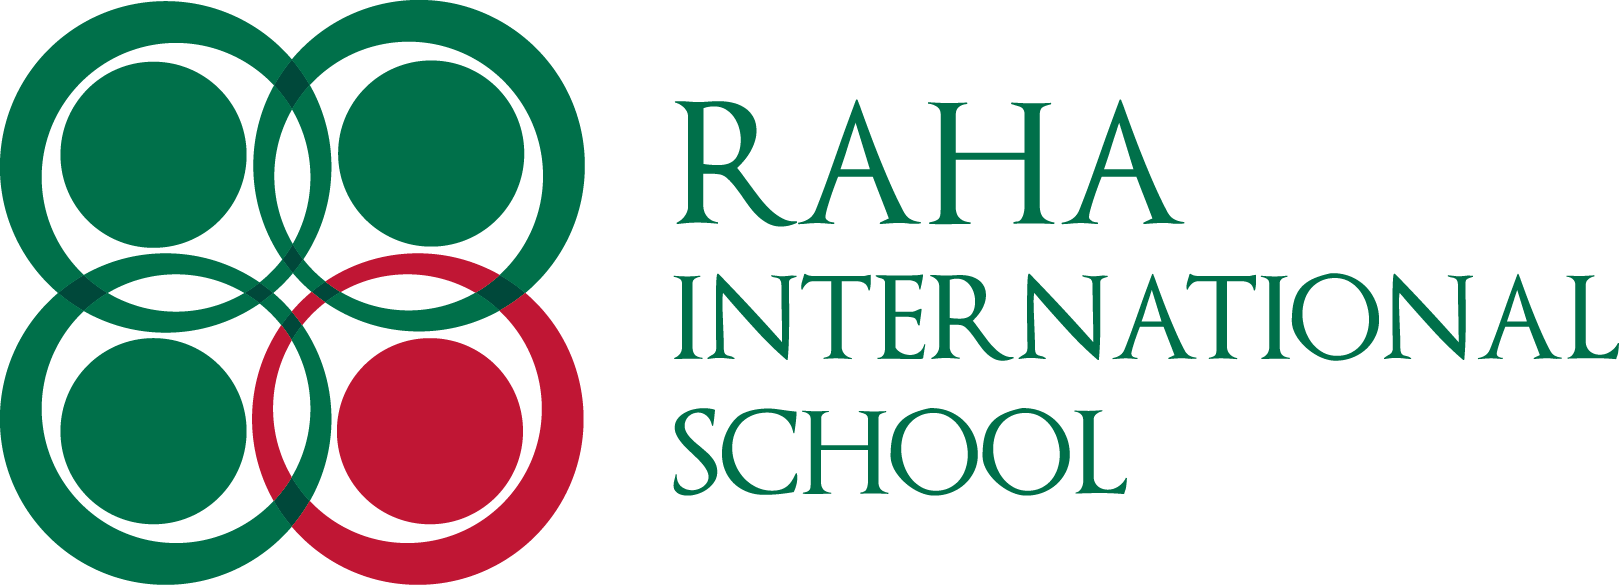 Mark Ryan via Twitter, Raha International School